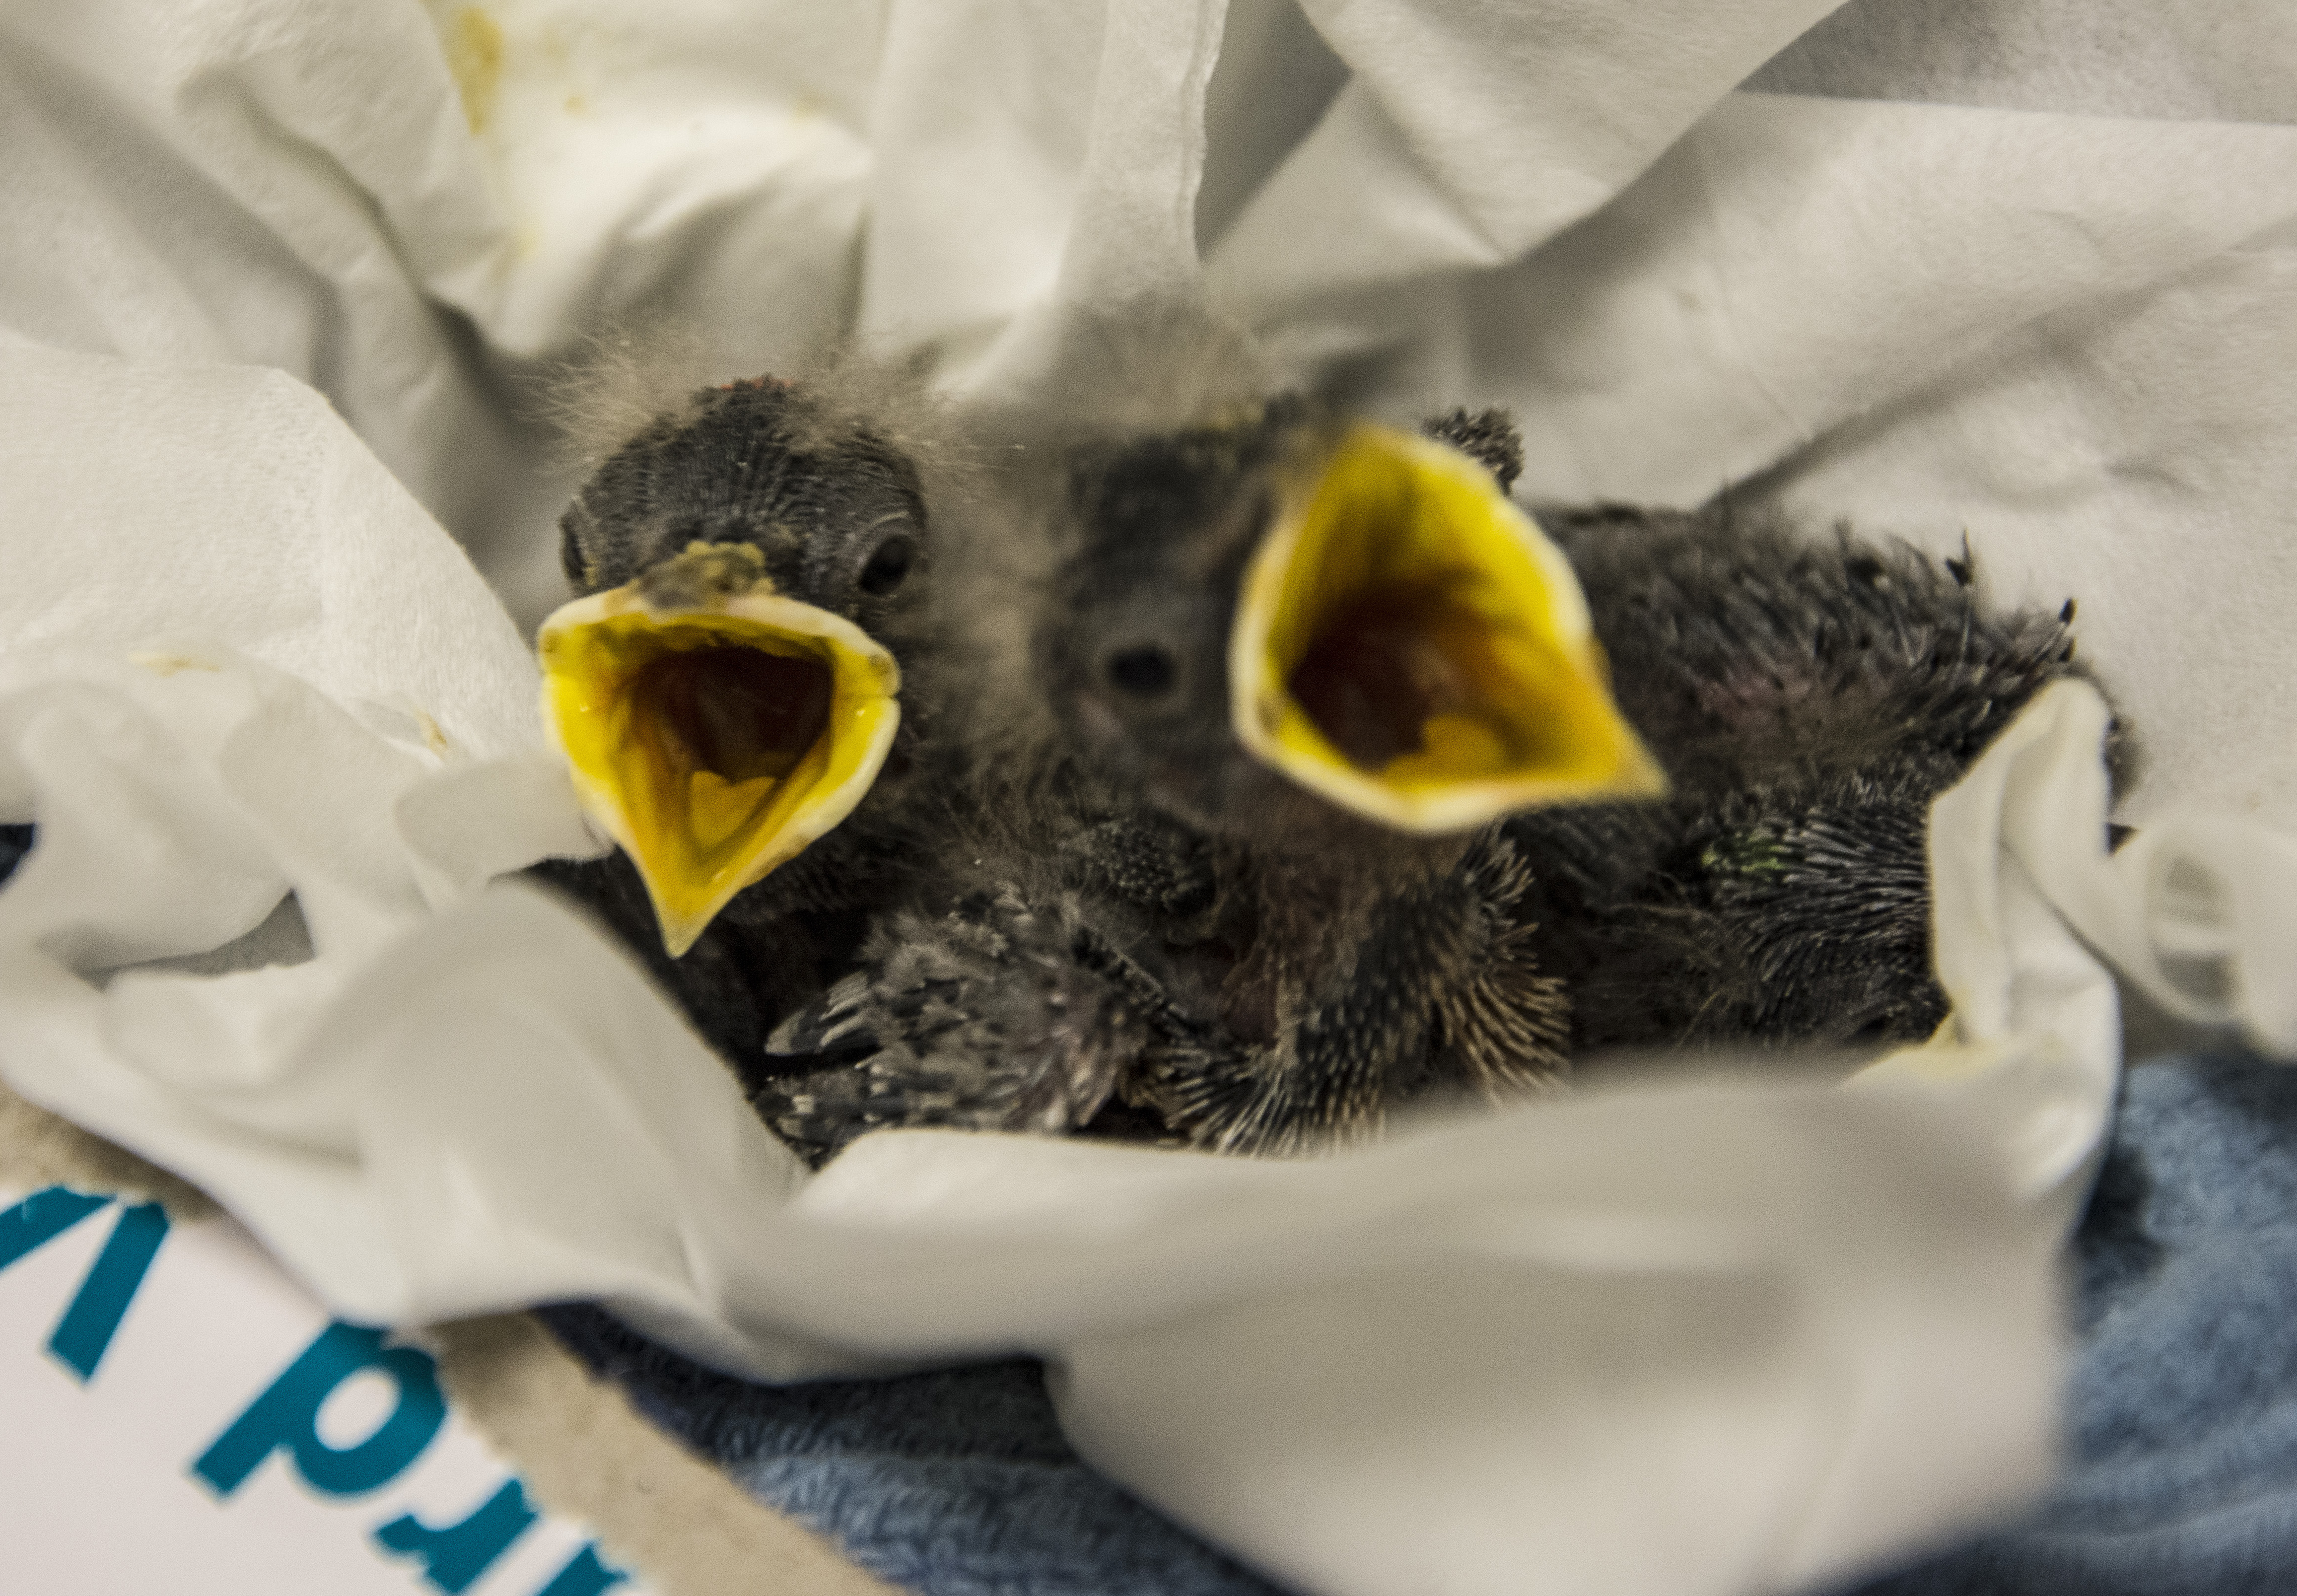 Nestlings at the Janet L. Swanson Wildlife Health Center